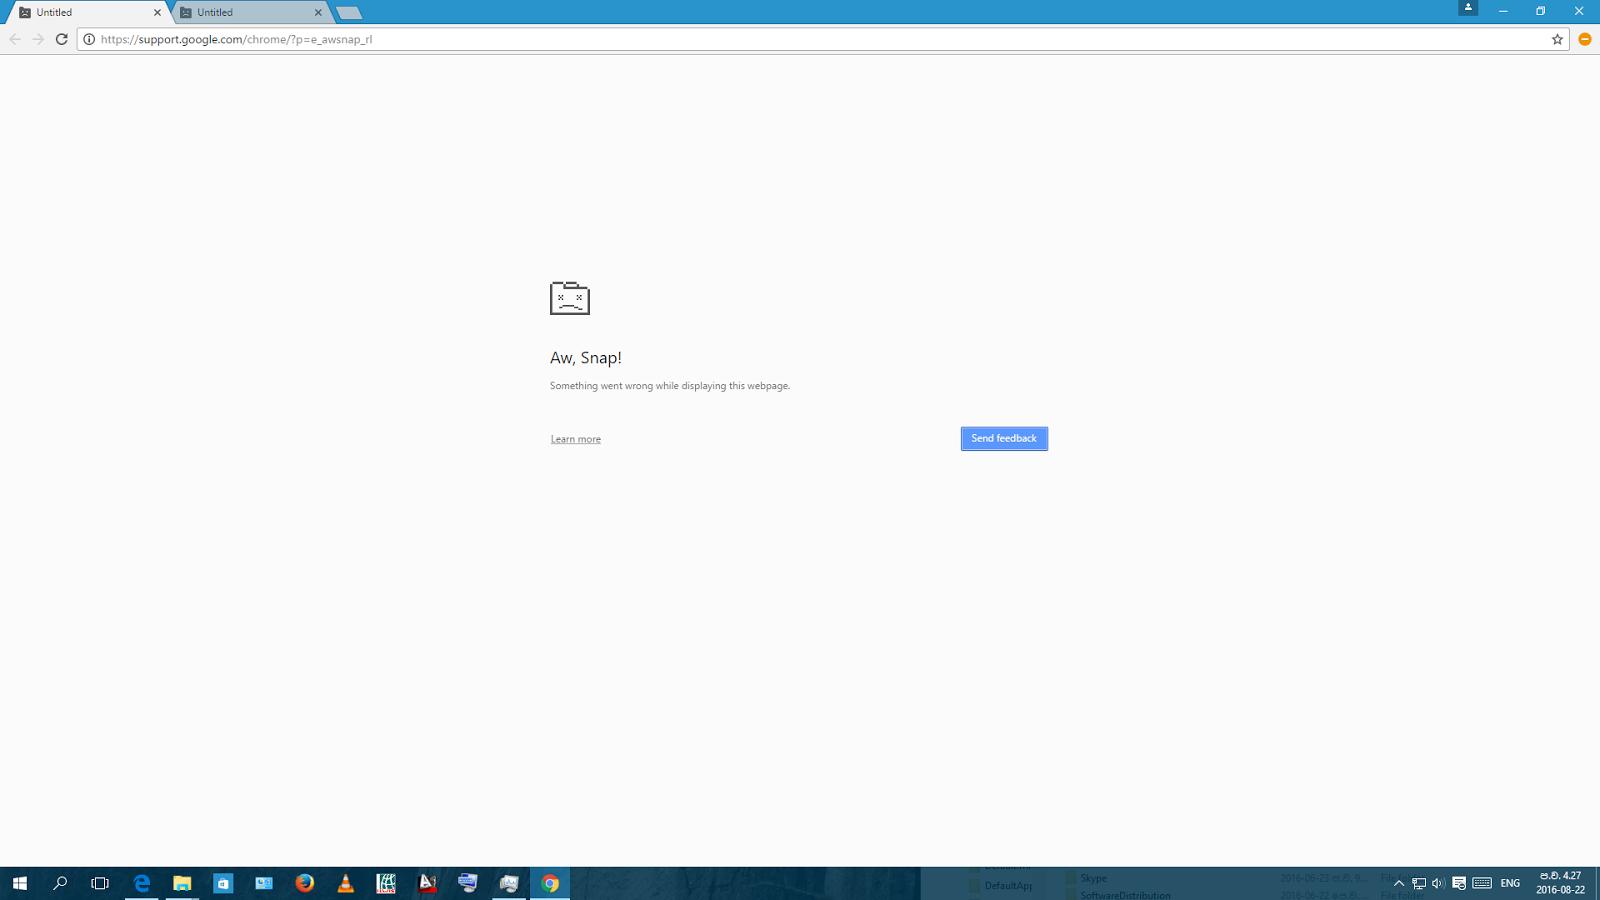 crash windows in windows 10 - Google Chrome Help